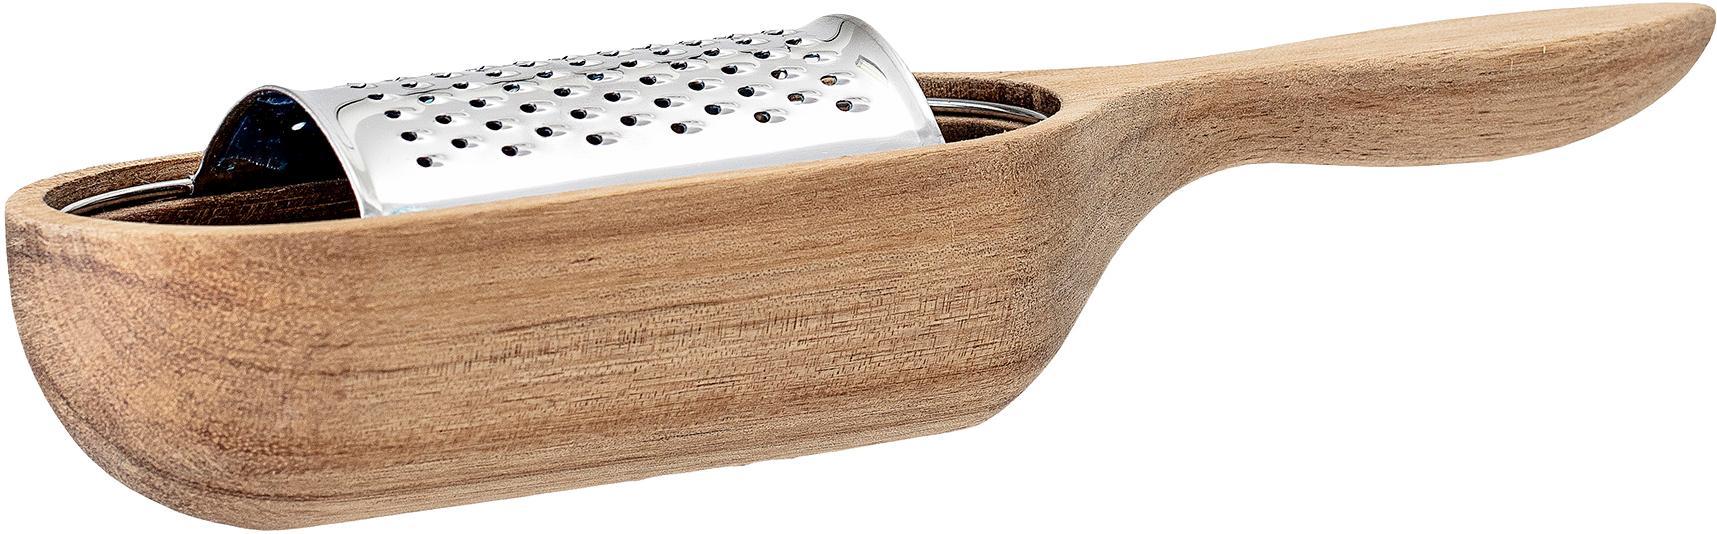 Set de rallador Acci, 2pzas., Rallador: acero inoxidable, Contenedor: madera de acacia, Madera de acacia, acero inoxidable, An 25 x F 7 cm